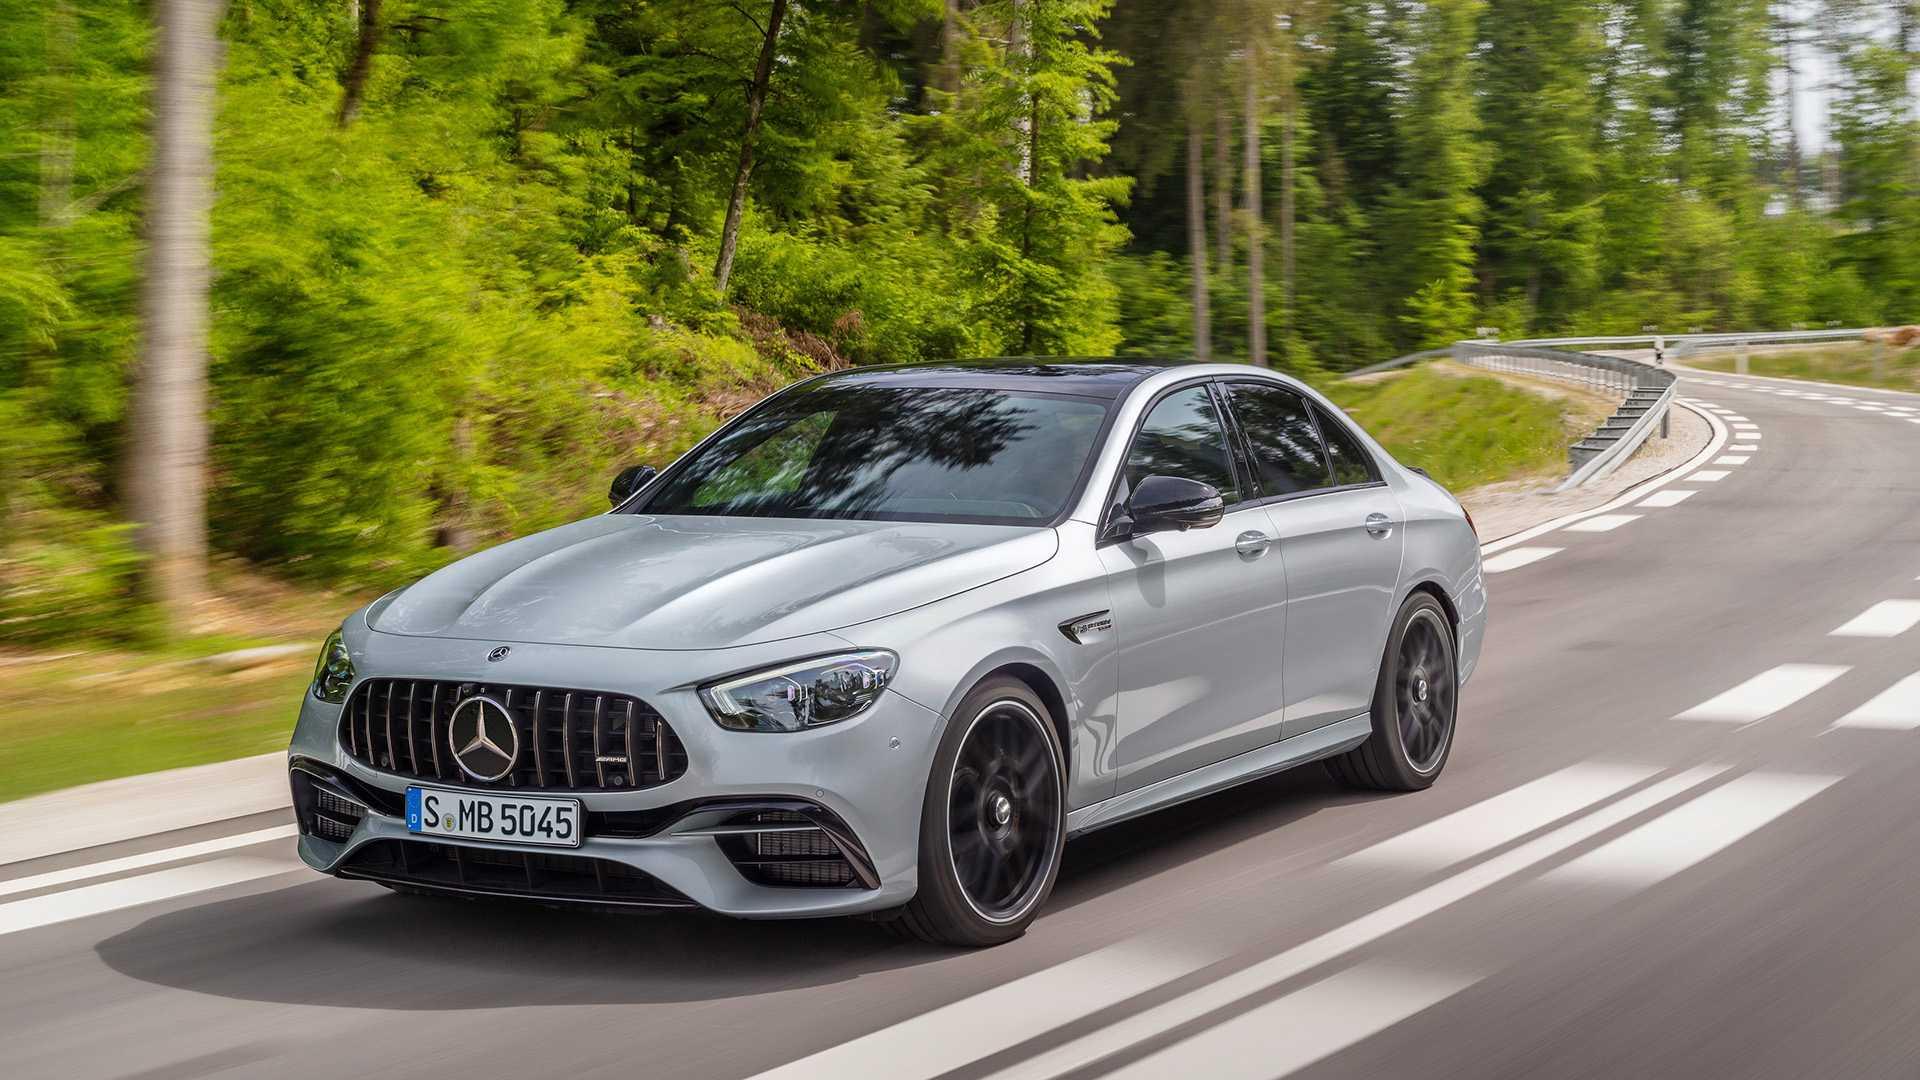 Mercedes-AMG E63 S vine în format Saloon sau Estate